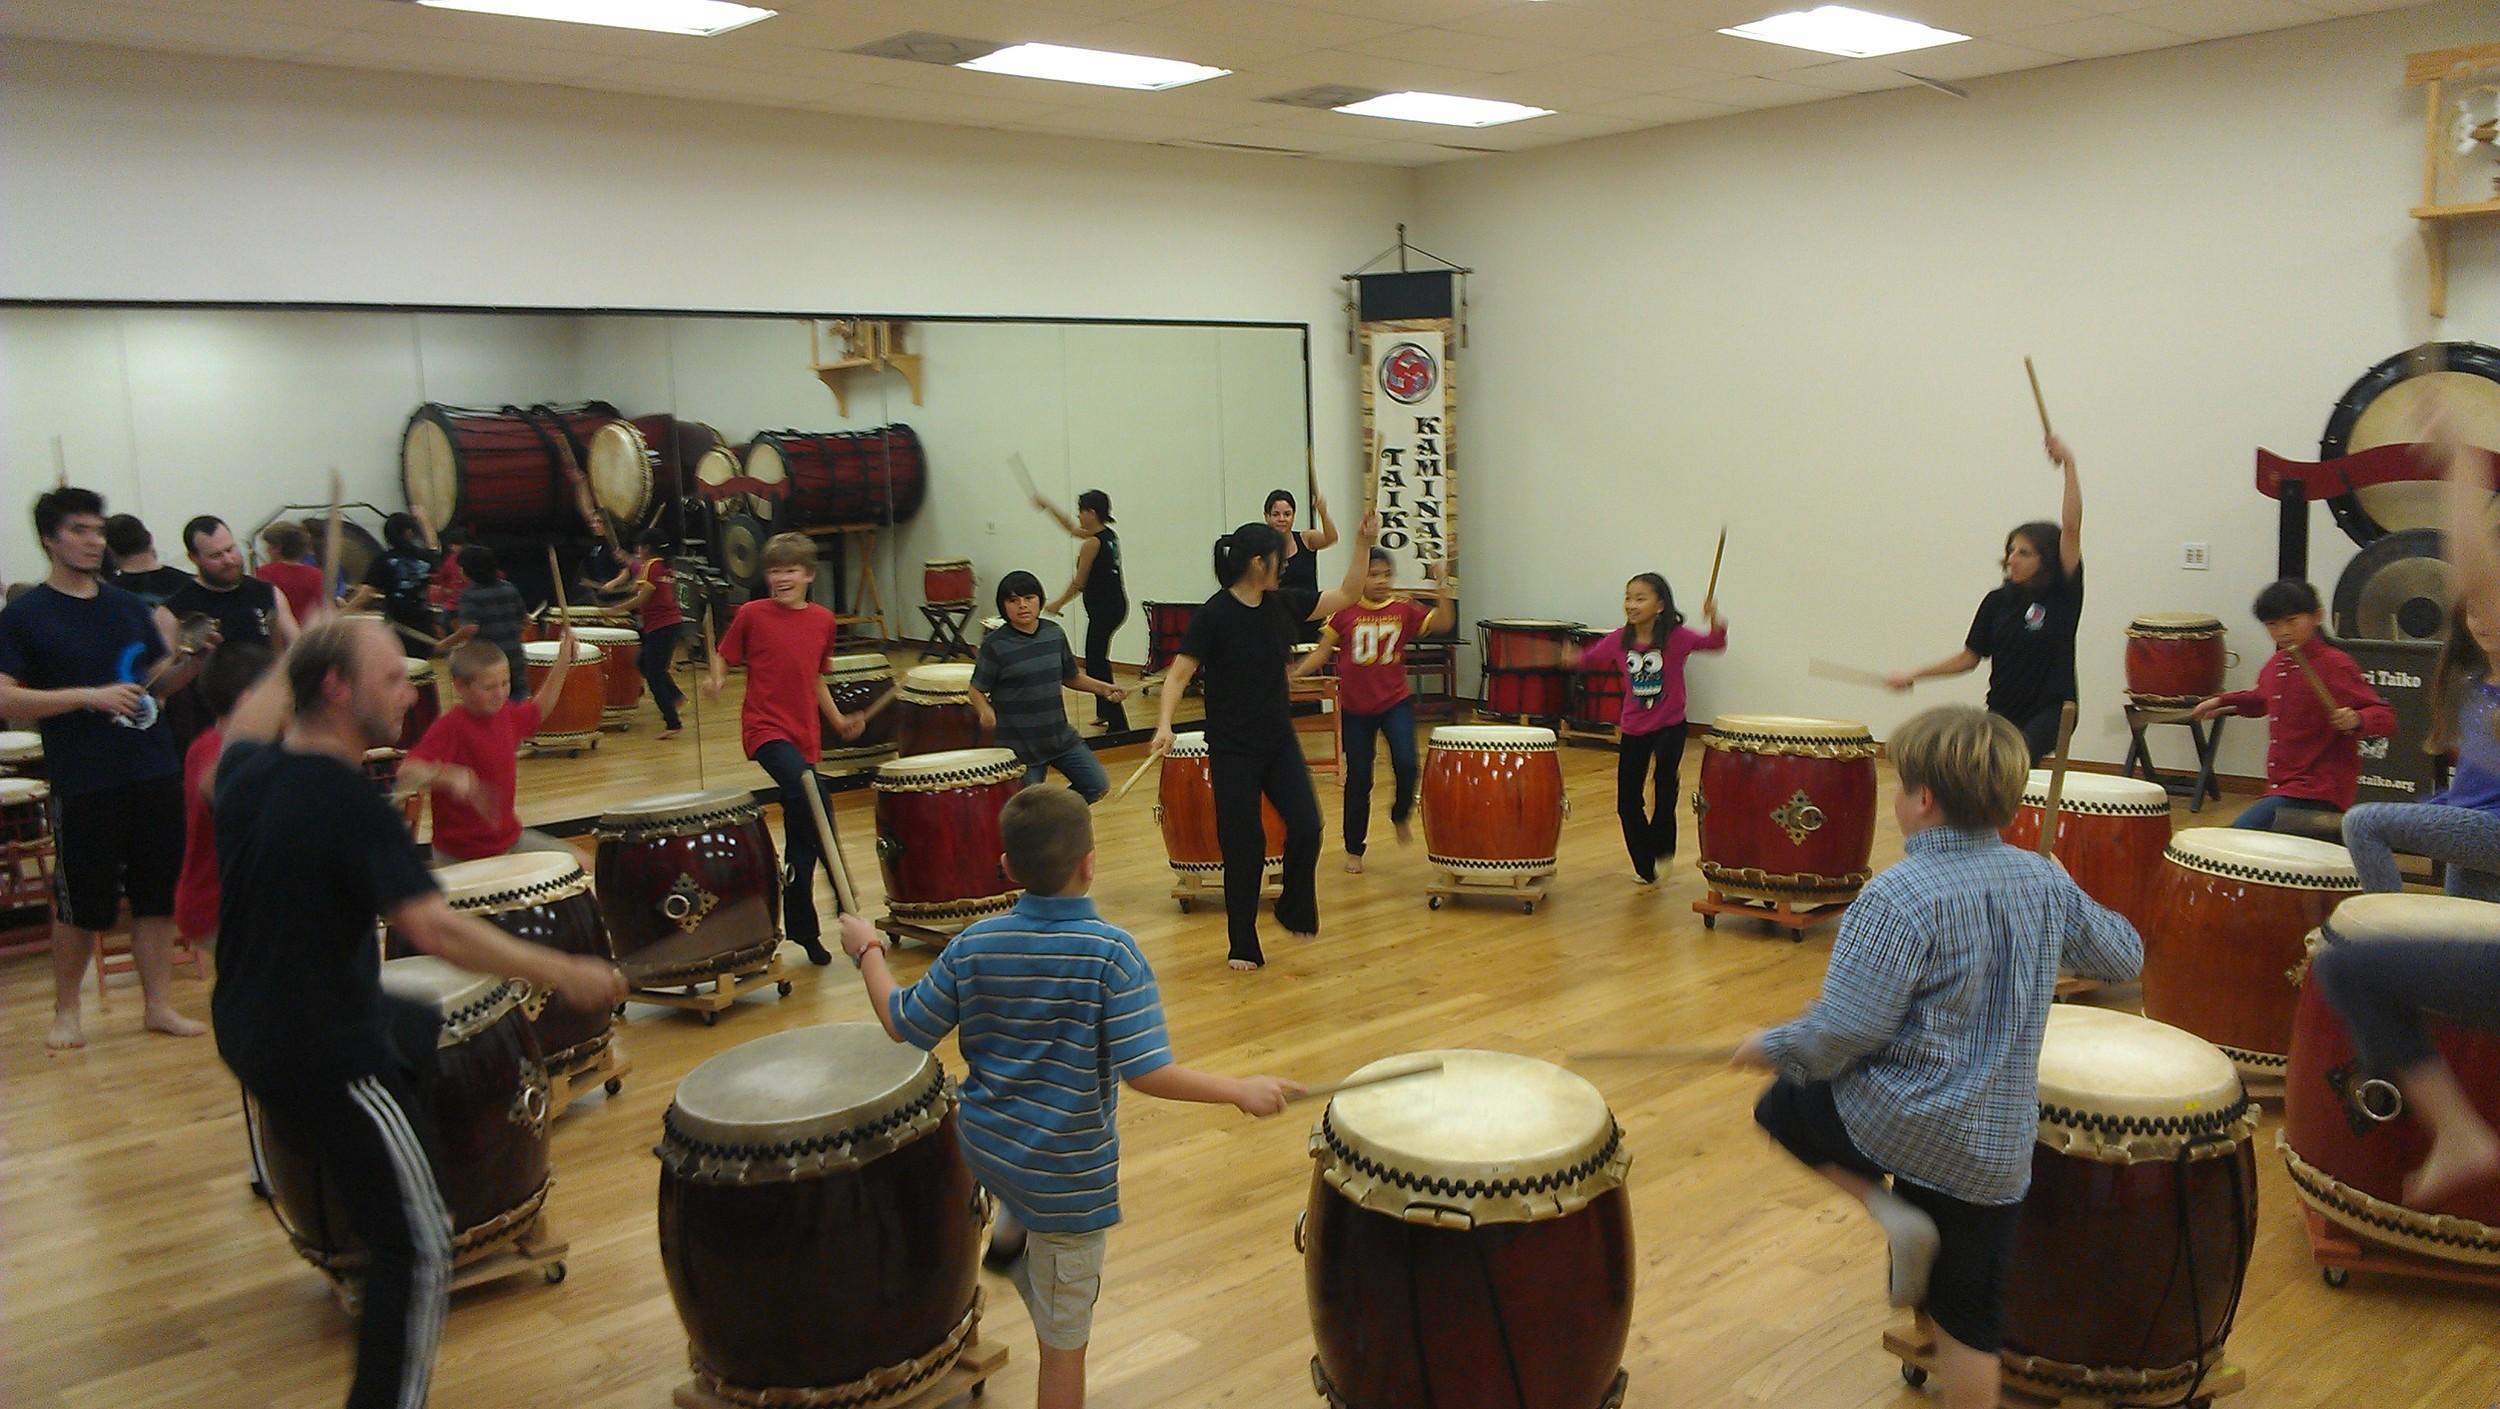 Kaminari Taiko members teacha children's taiko class. Playing taiko engages the whole body to make music.